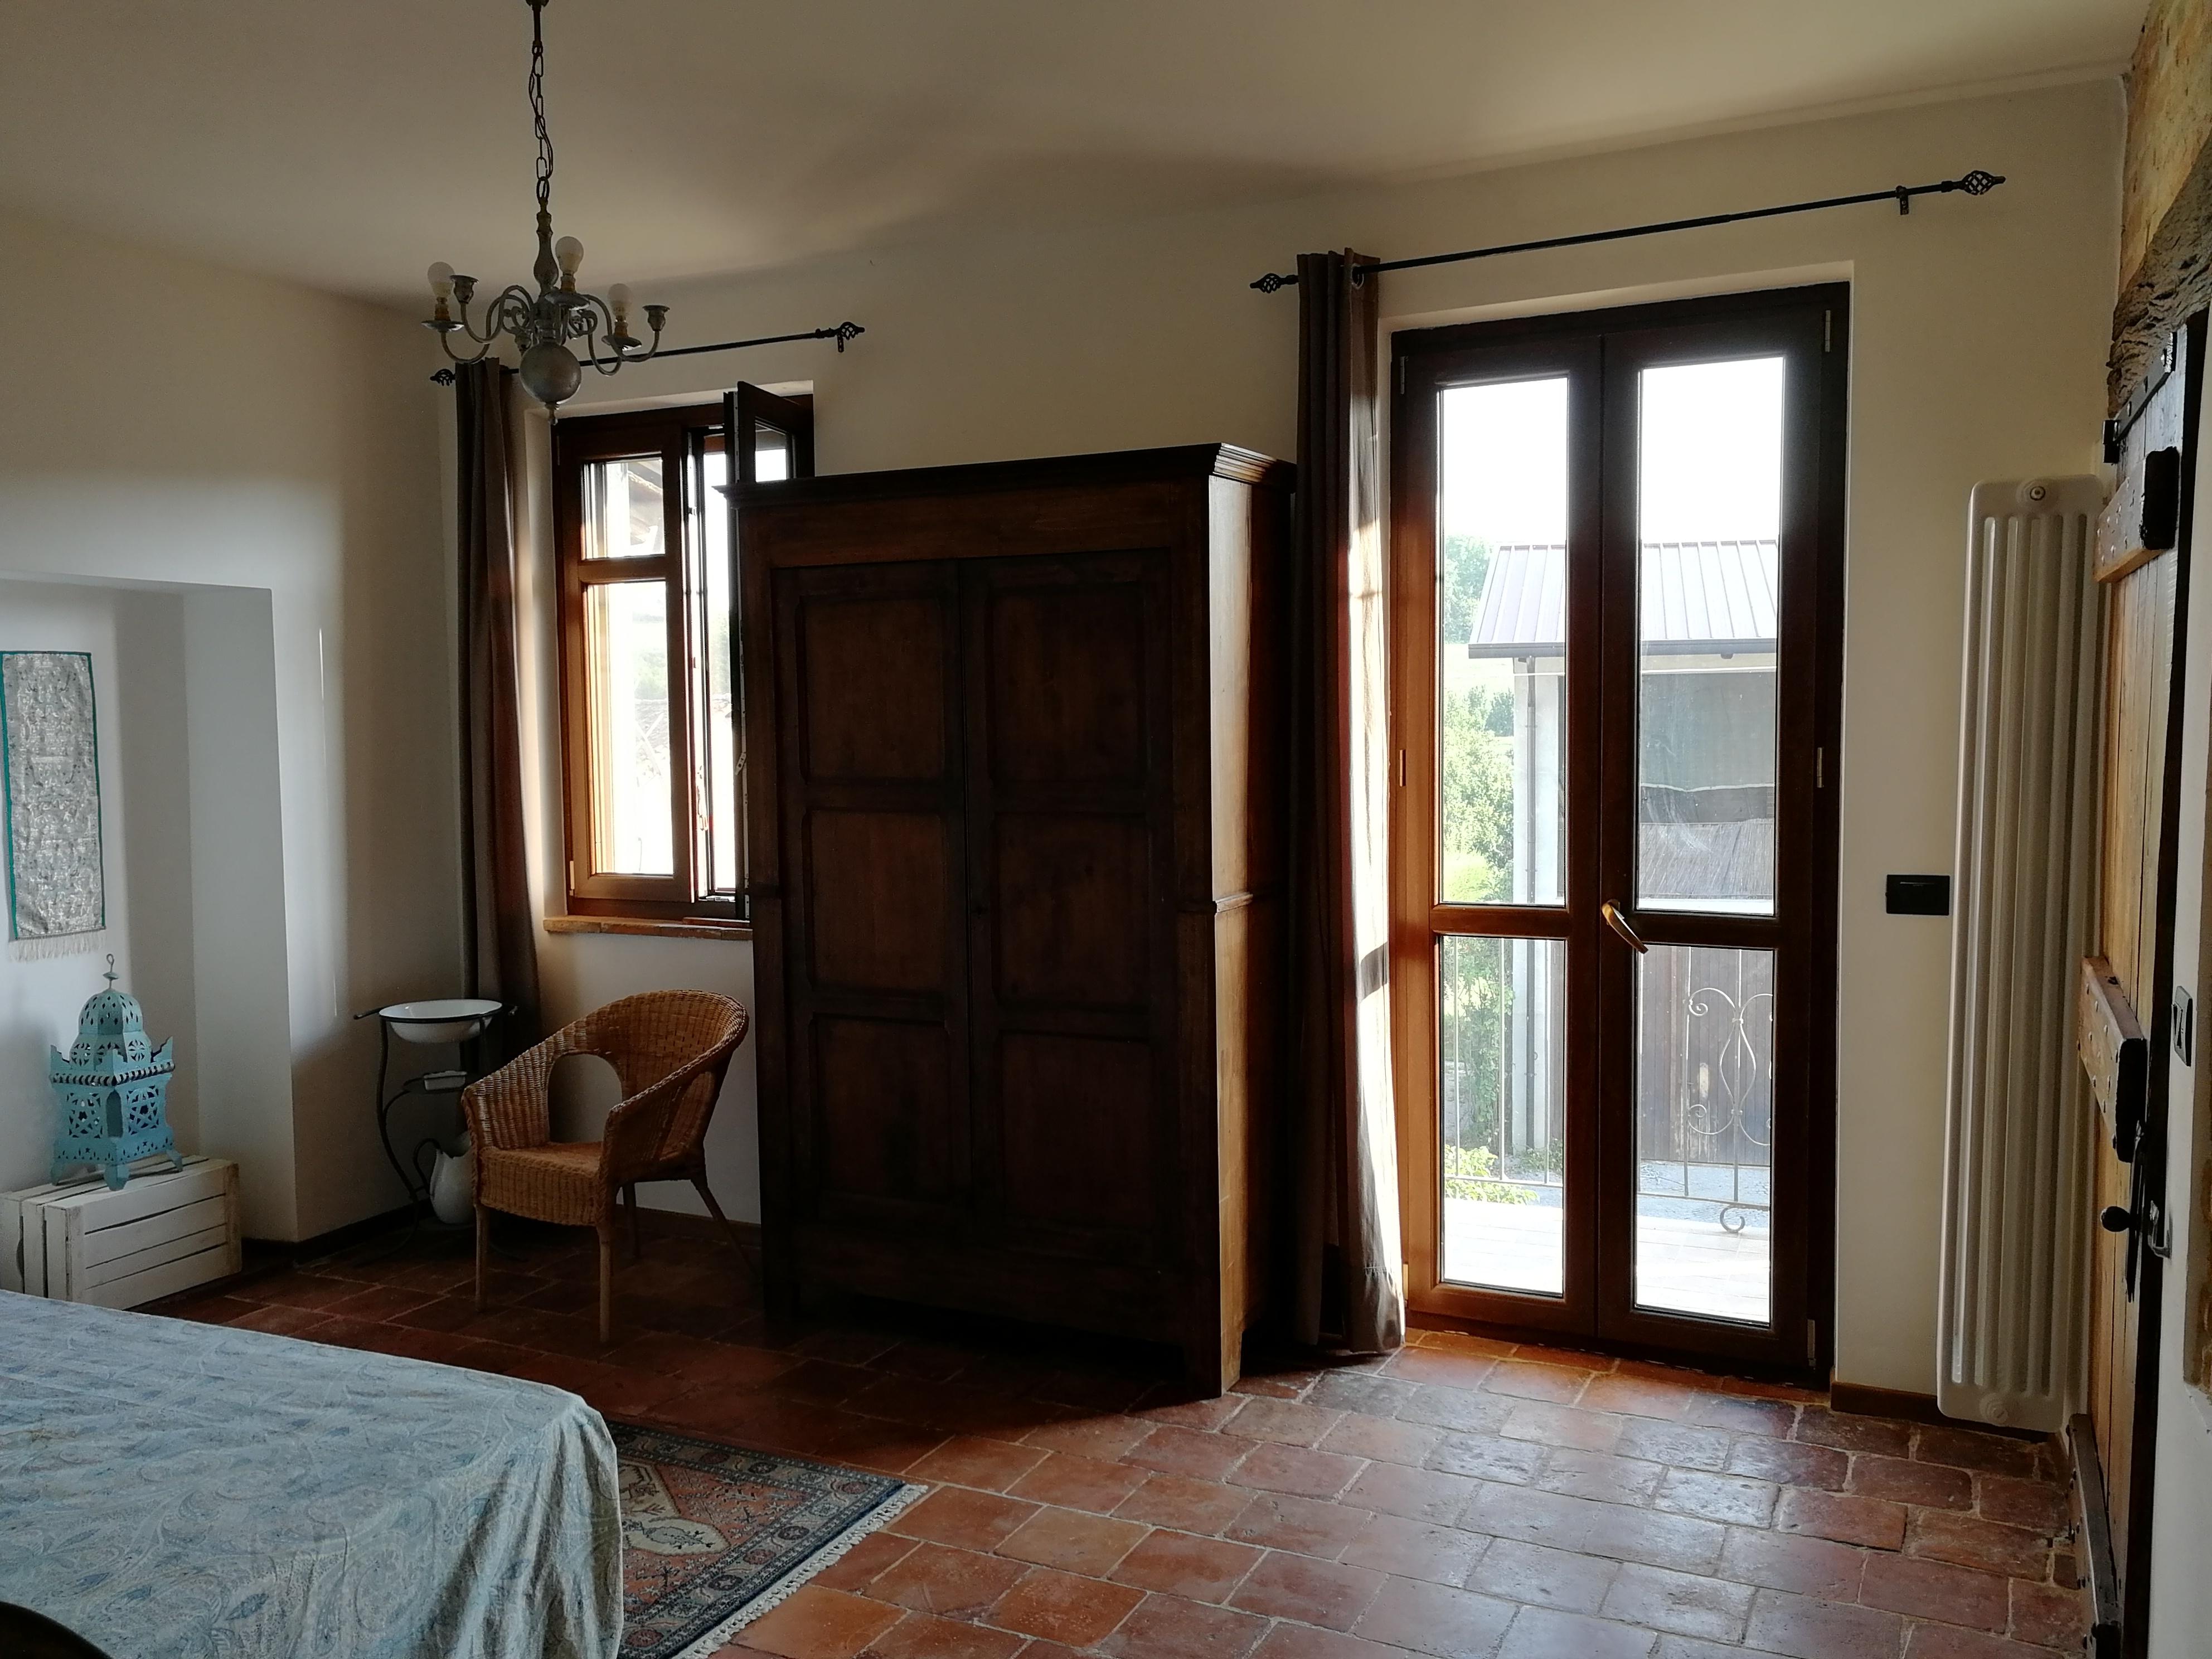 Da Bilocale A Trilocale scapa da ca' 3 bilocale+trilocale - houses for rent in